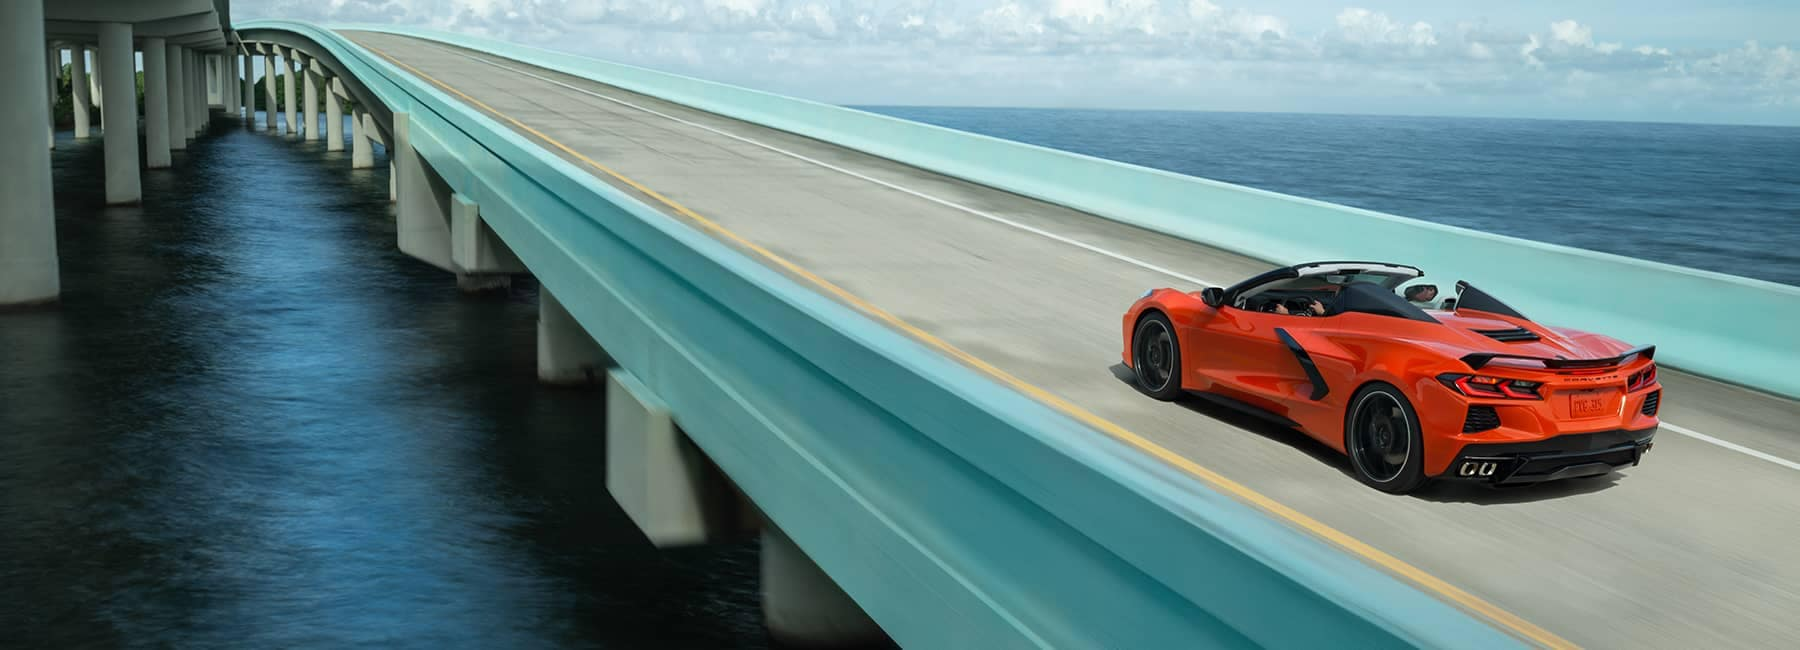 Red 2020 Chevrolet Corvette Stingray Convertible Driving on an Ocean Highway